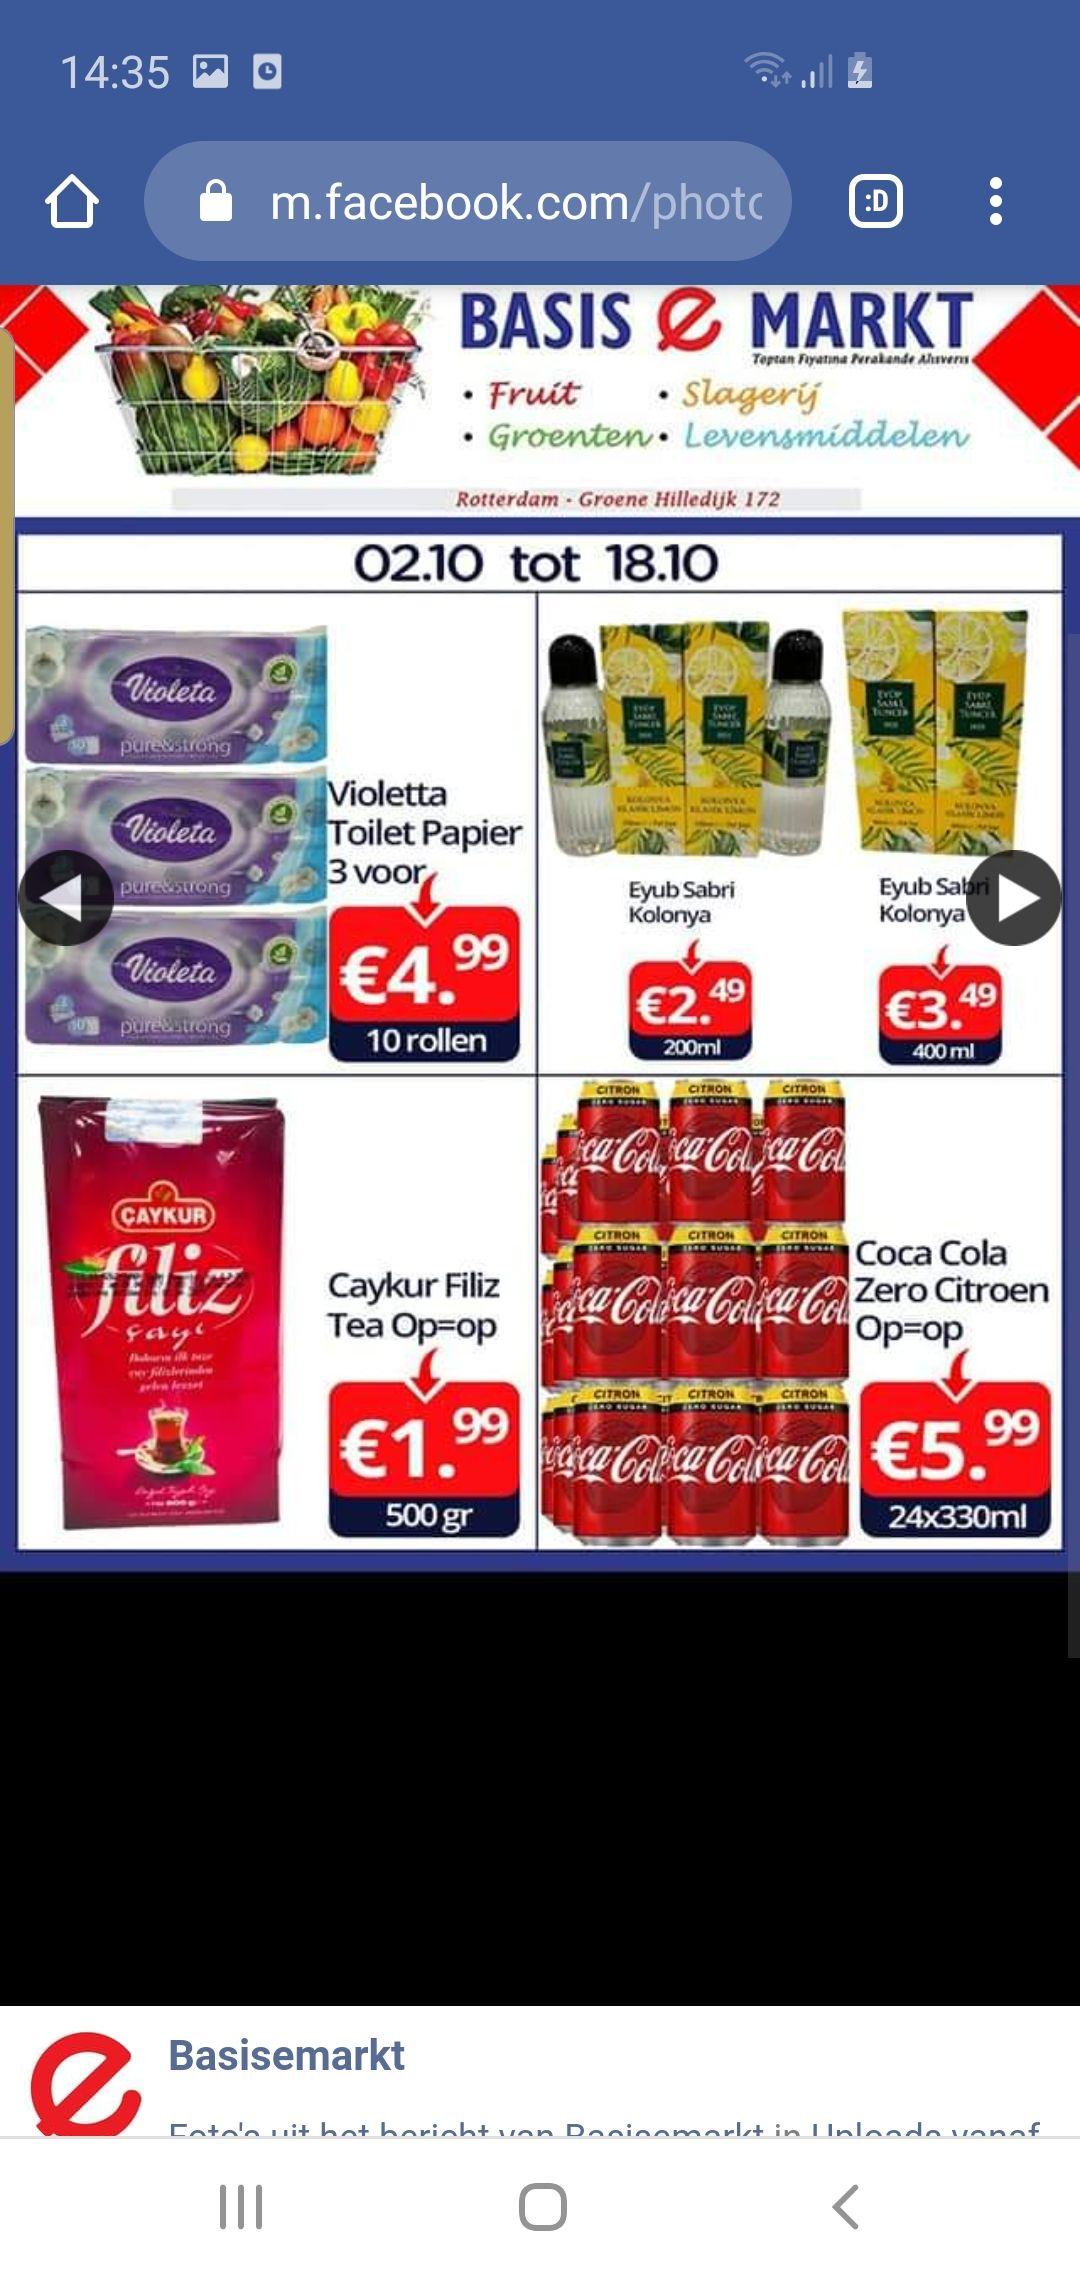 Lokaal rotterdam basis e markt 24 coca cola zero citroen 330ml